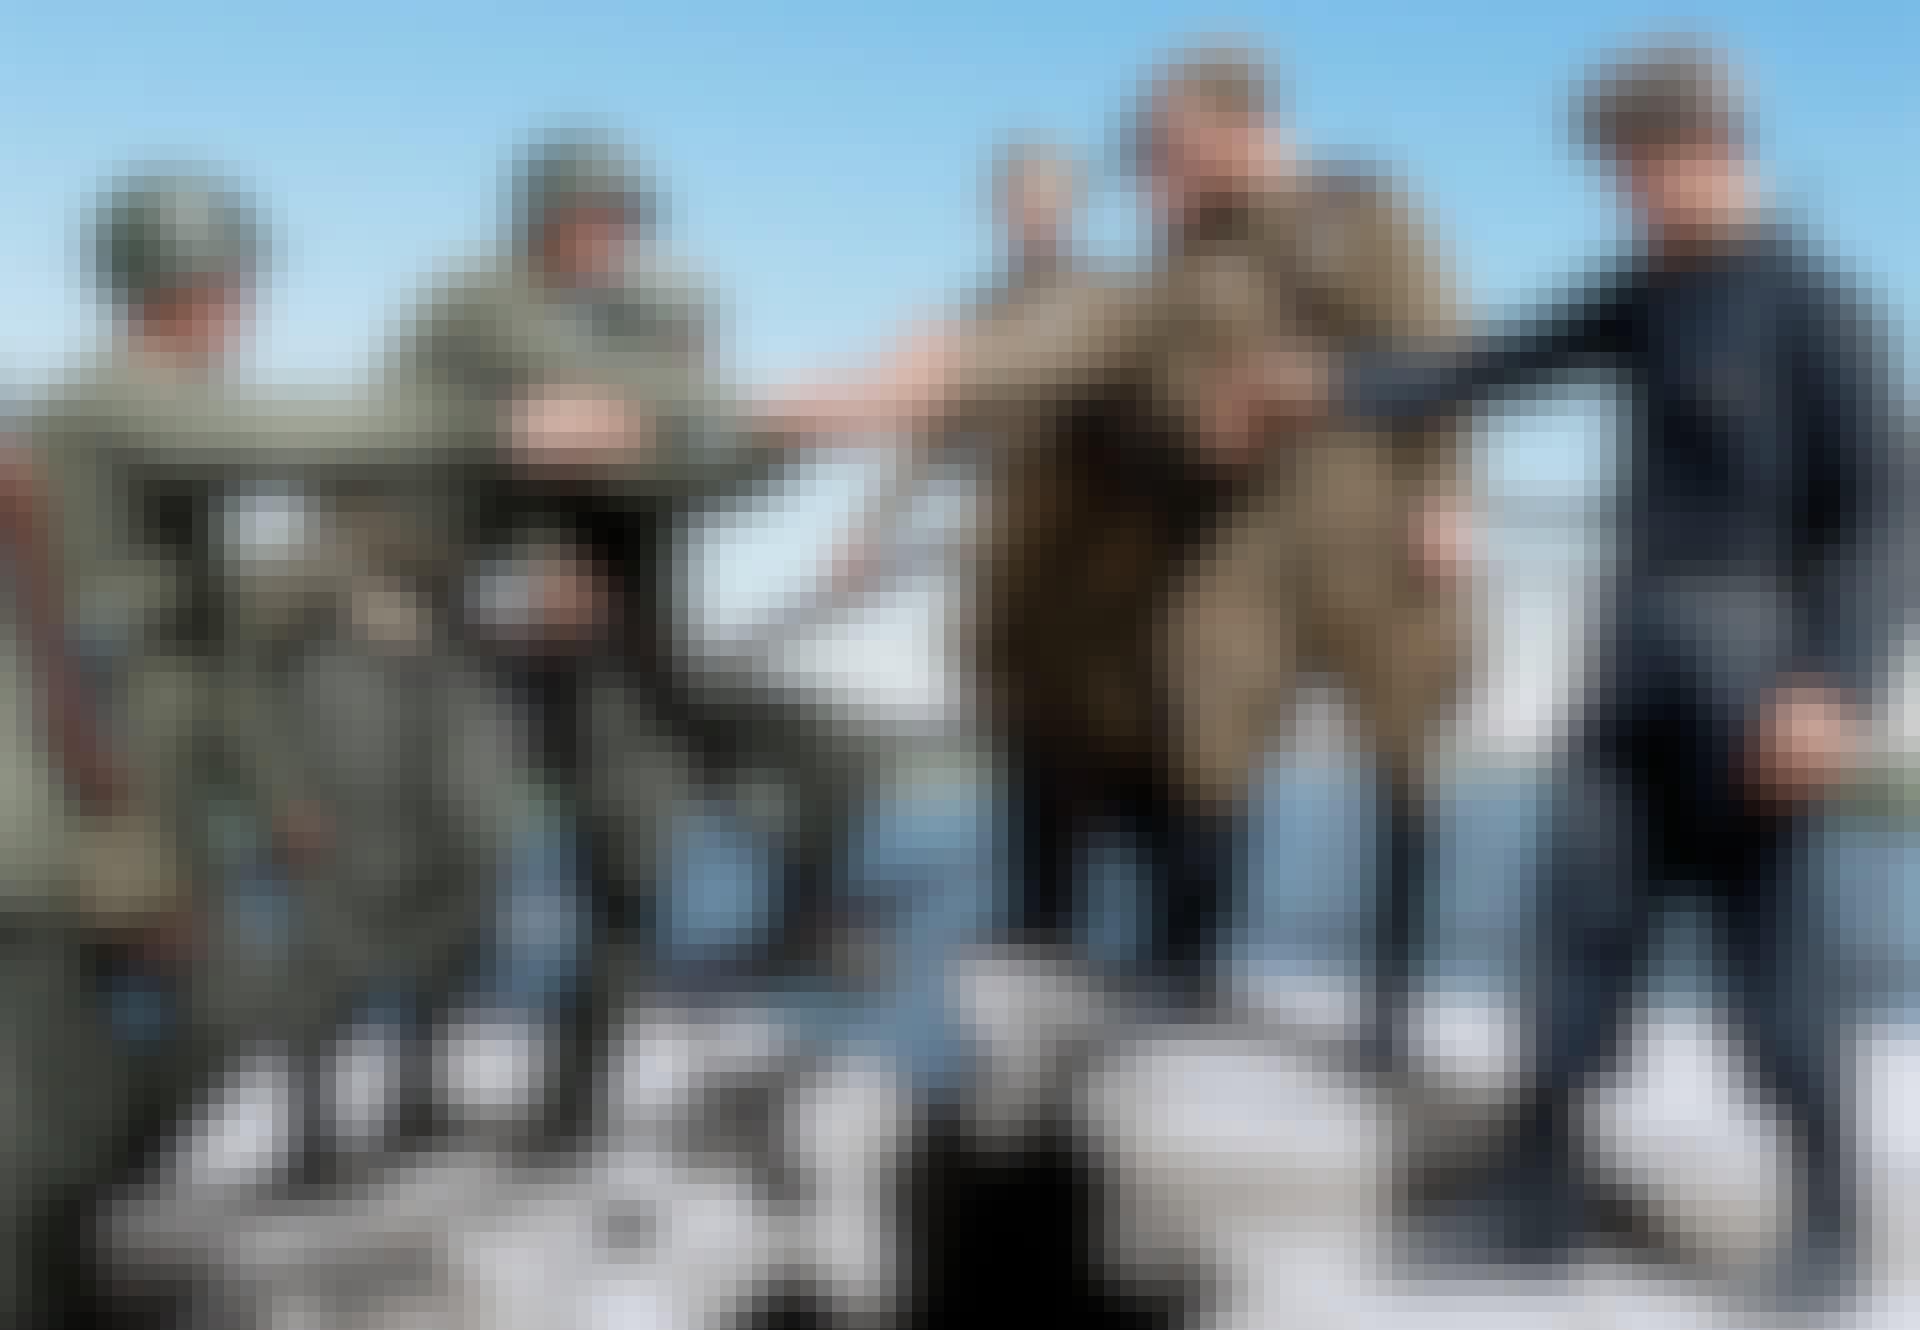 amerikanska soldater röda armén möts i torgau